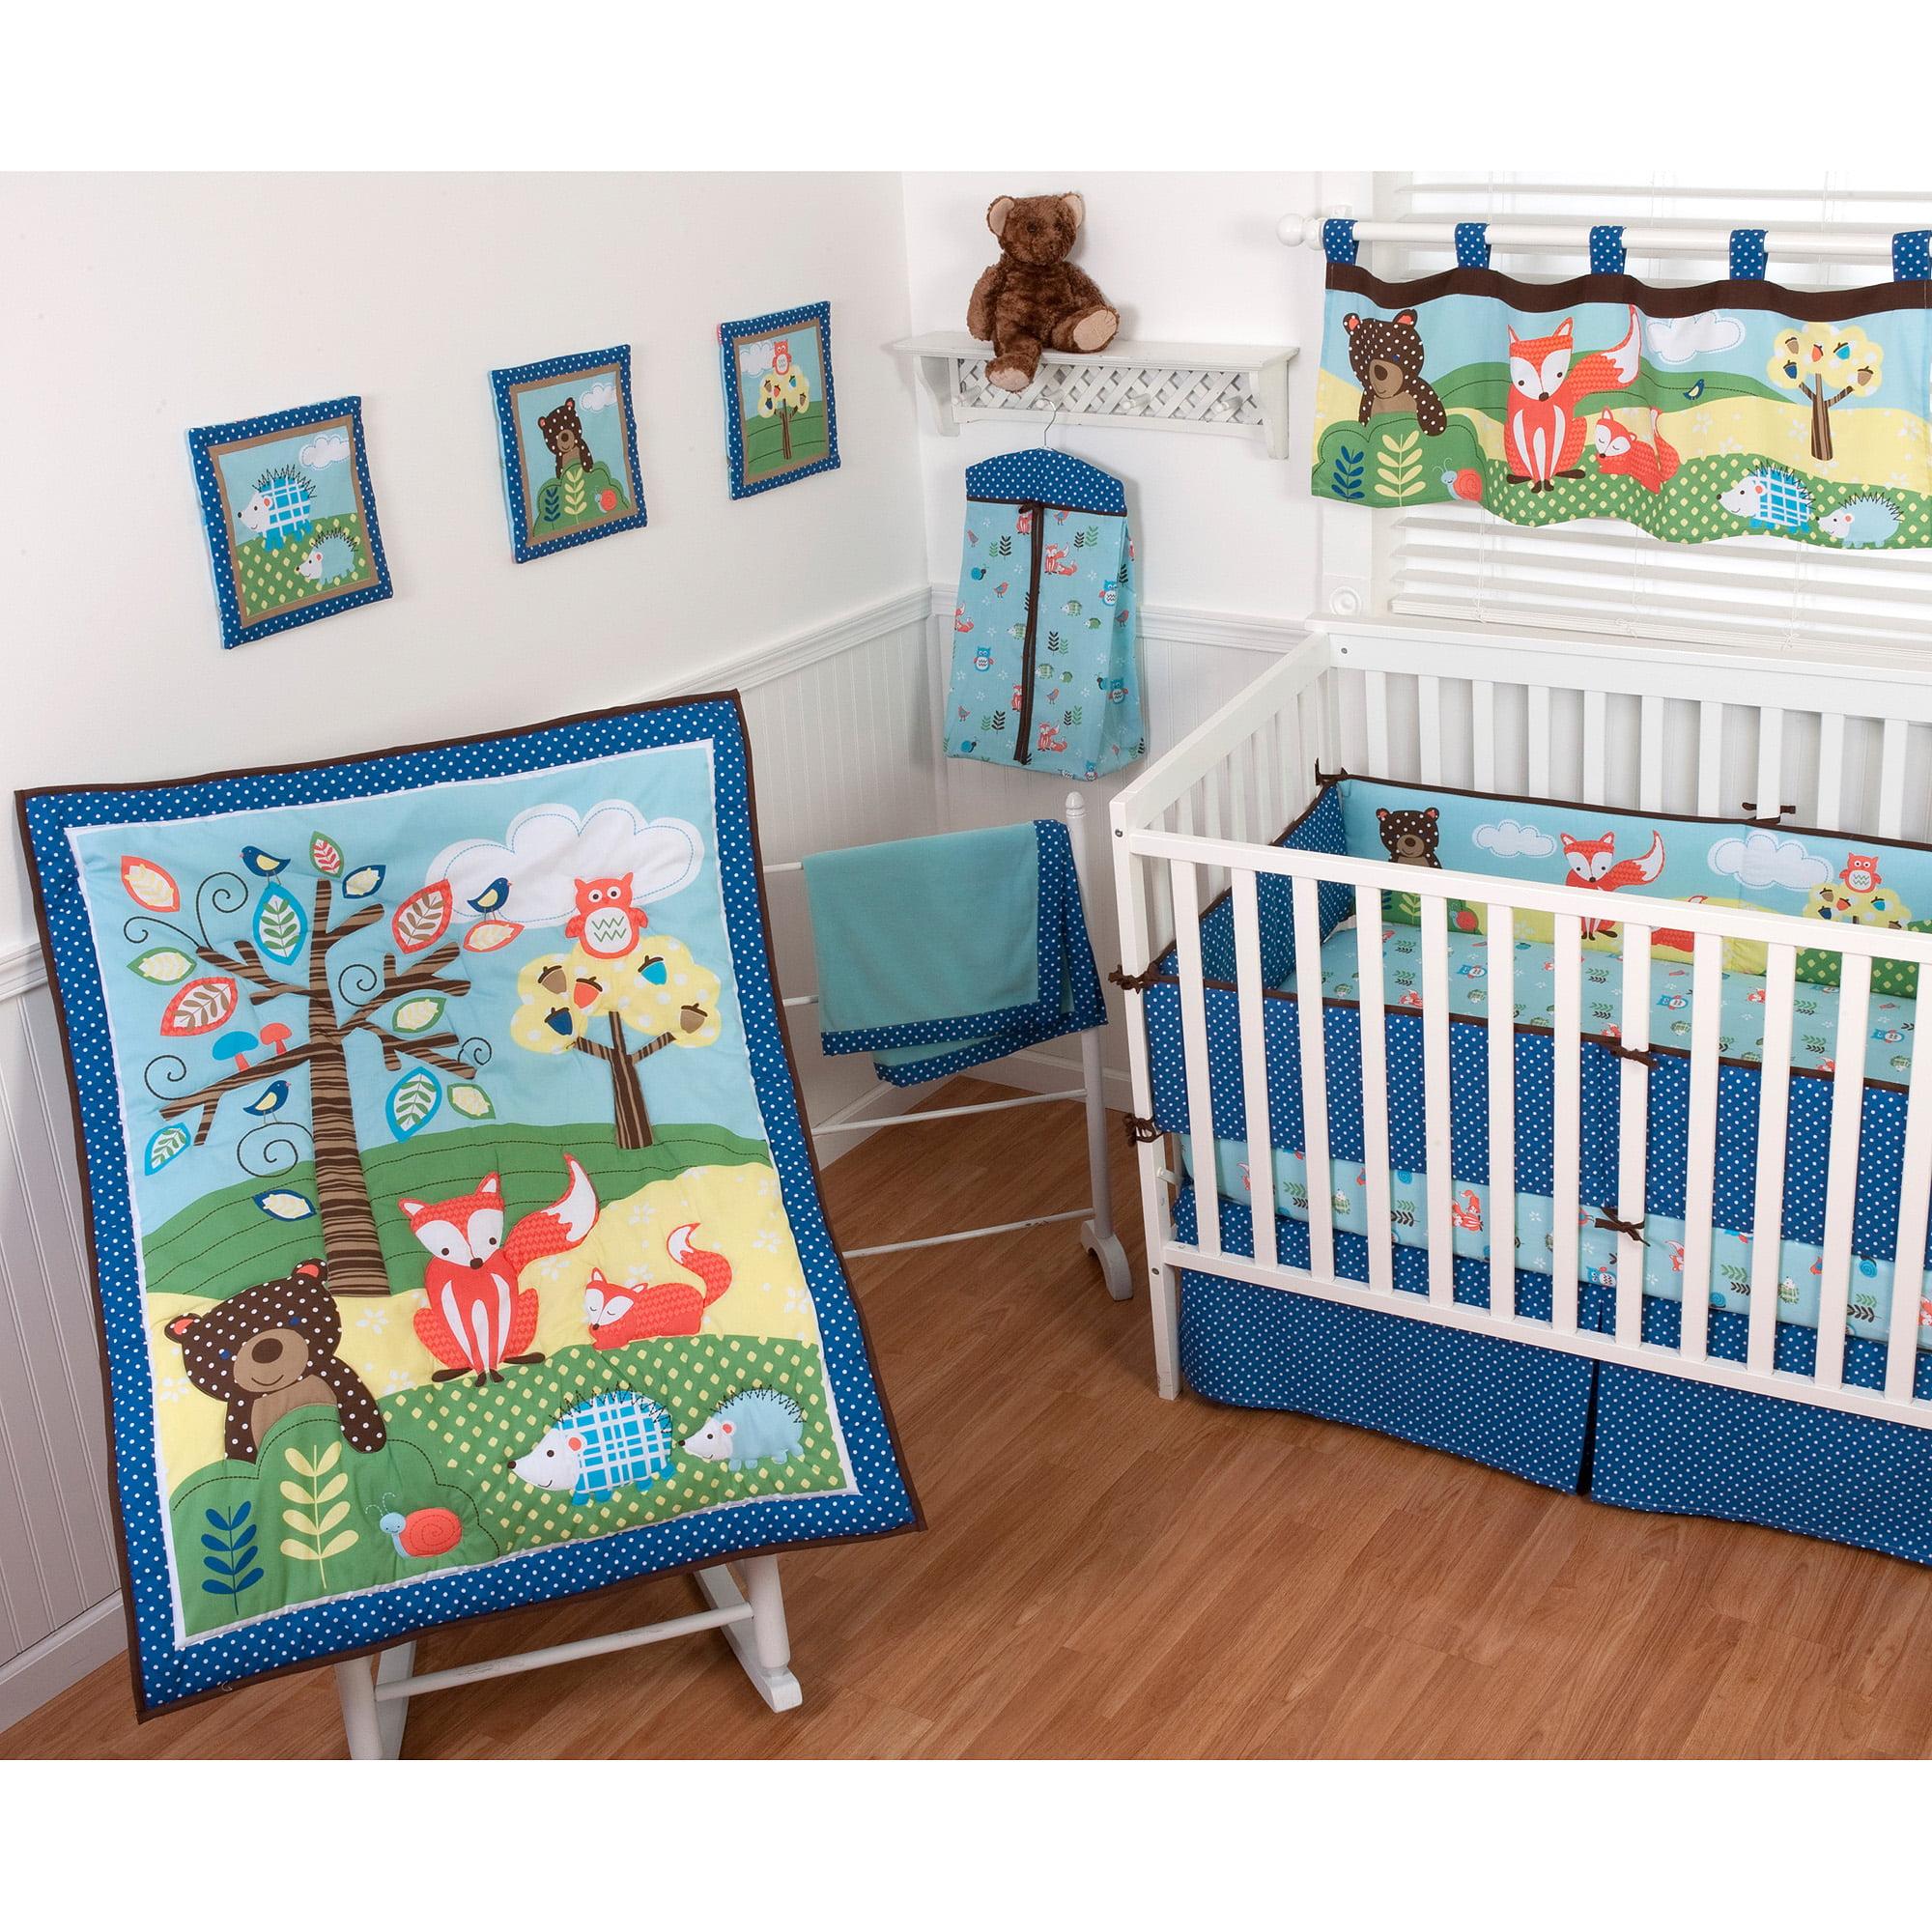 Sumersault Foxy Friends 9 Piece Nursery In A Bag Crib Bedding Set With Bonus Per